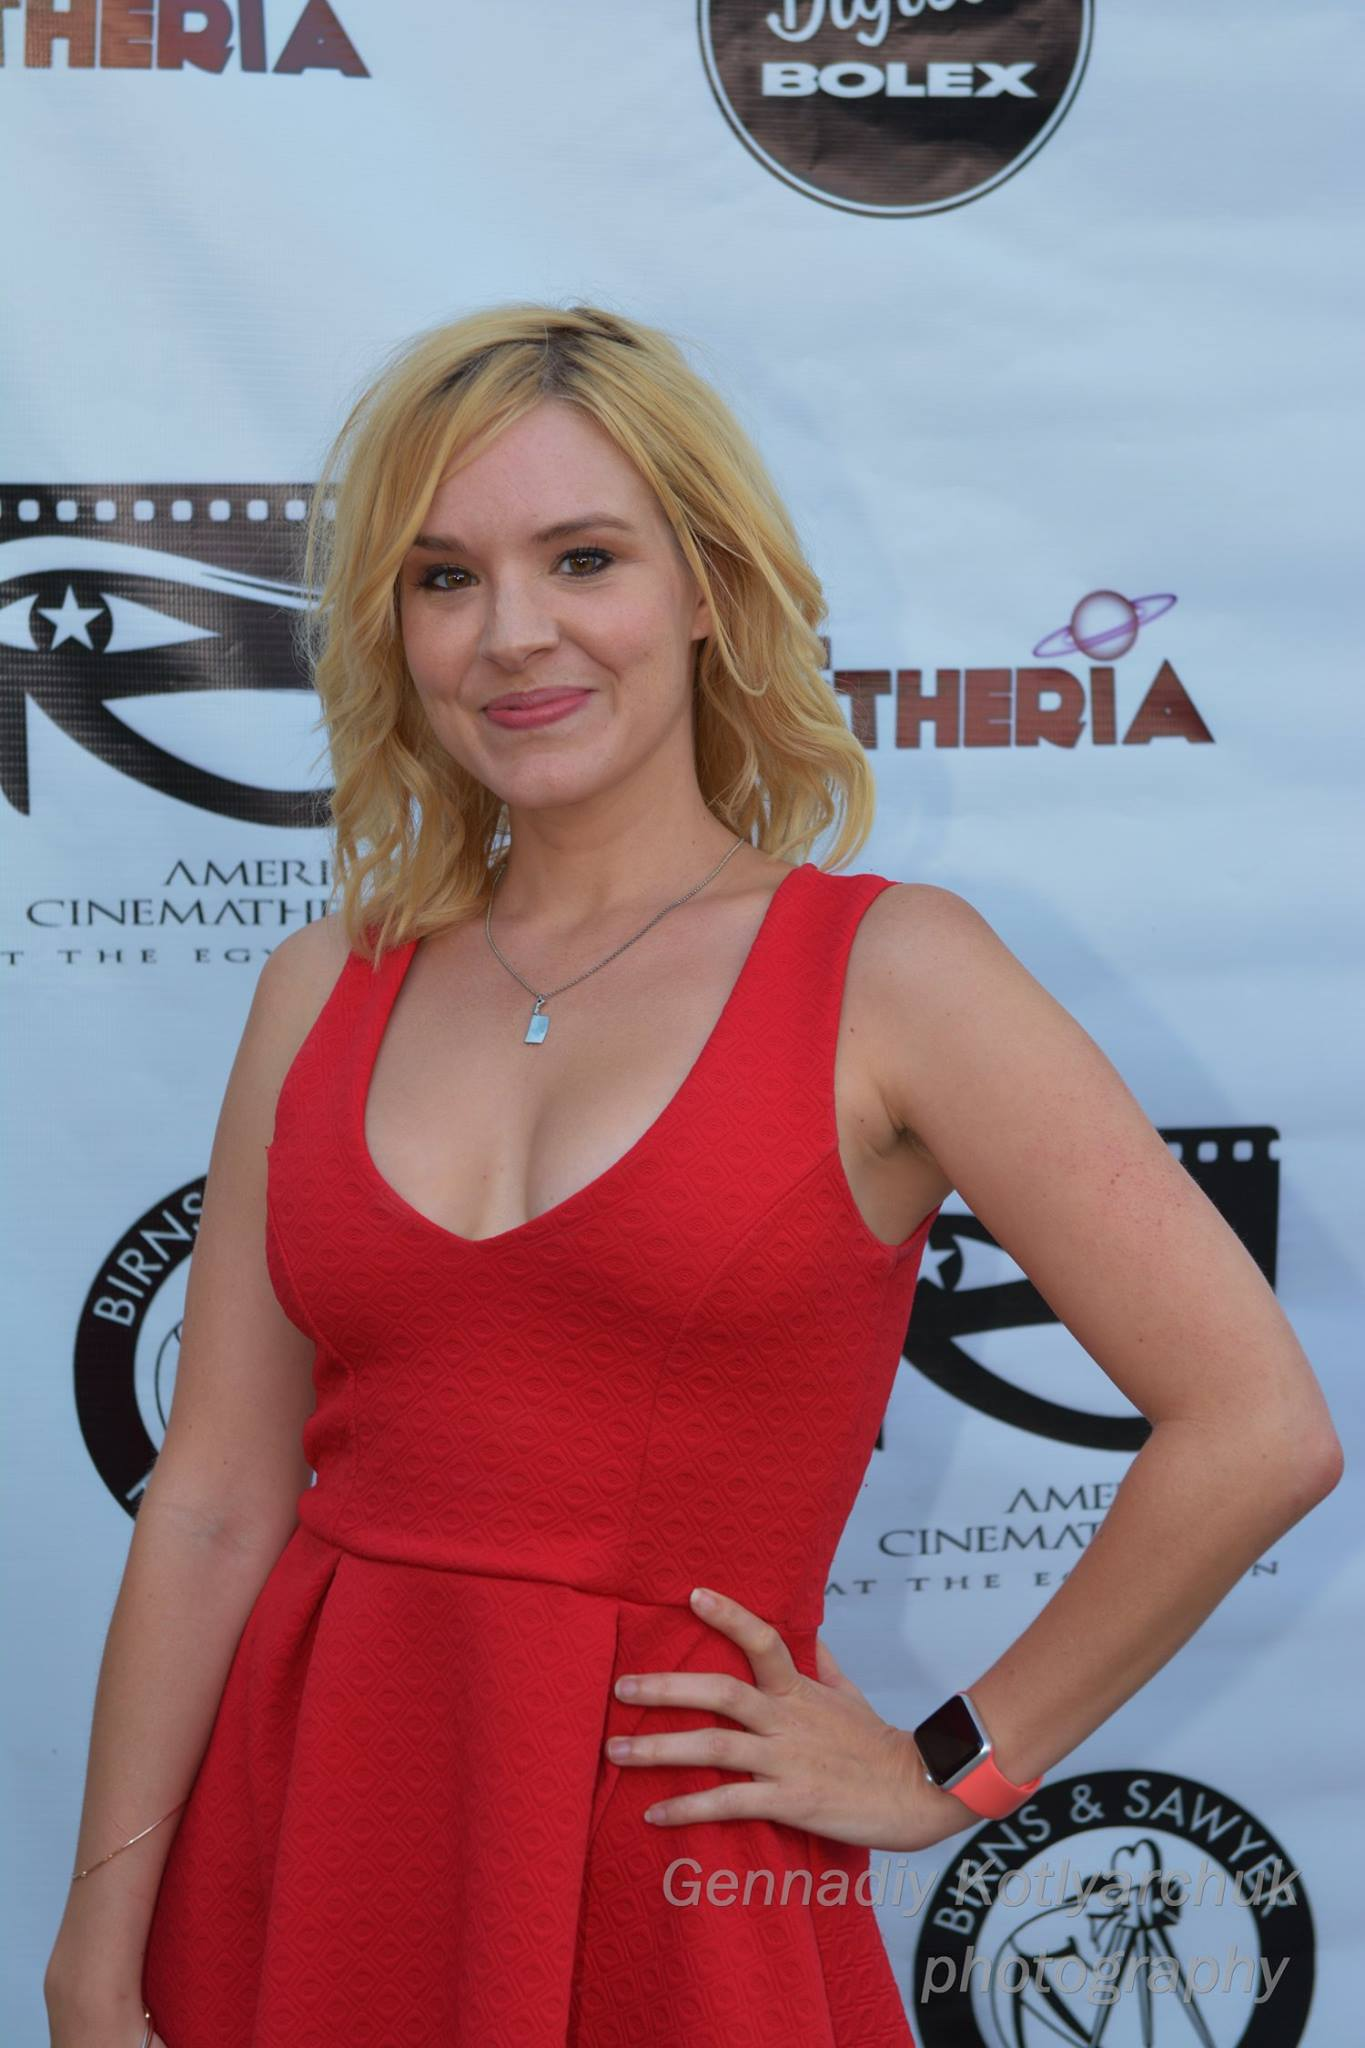 Brea Grant at Etheria Film Night 2015